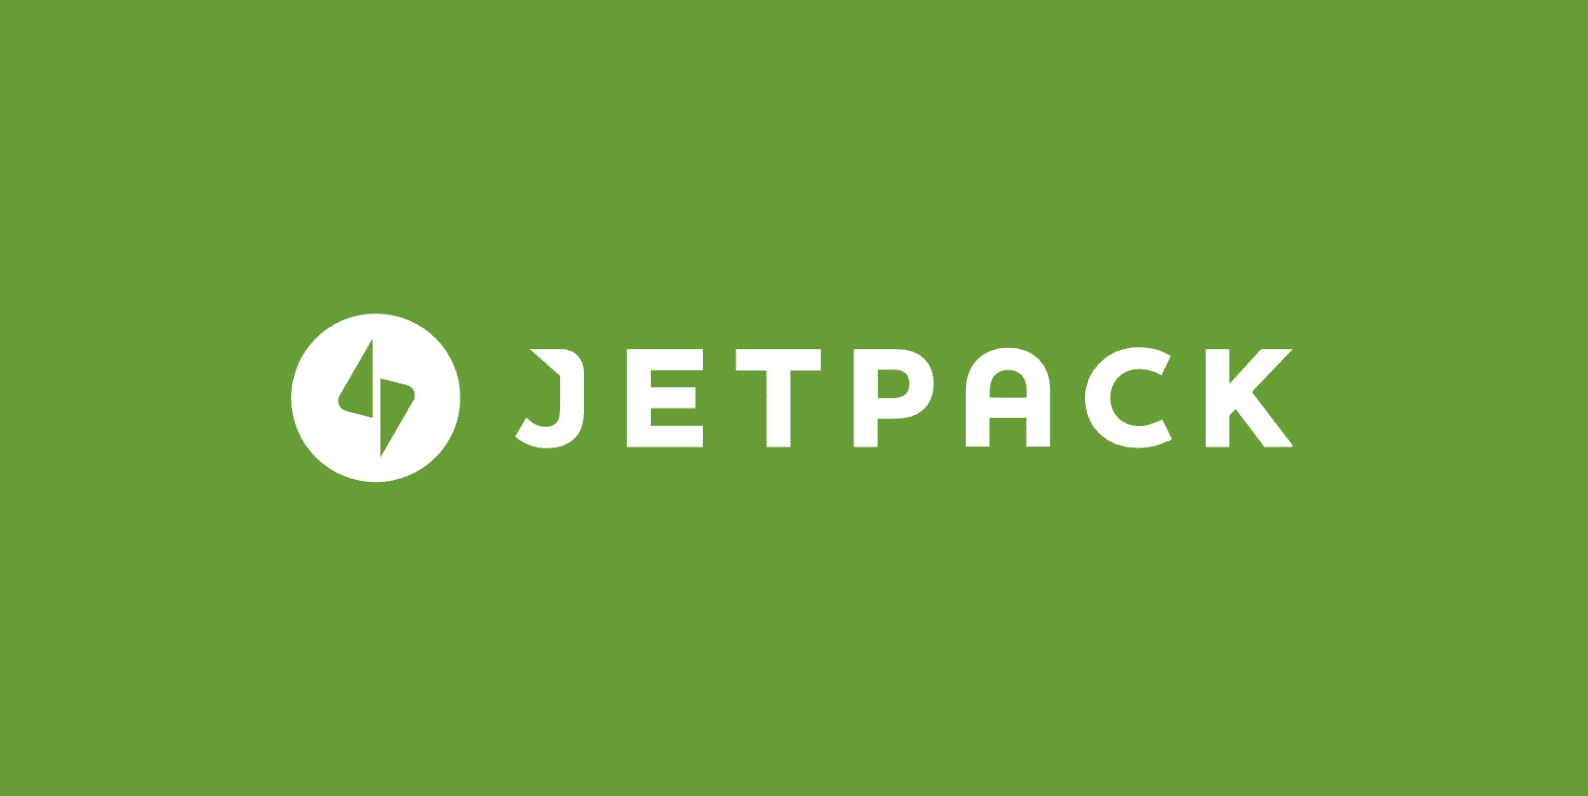 WordPress Jetpack security plugin